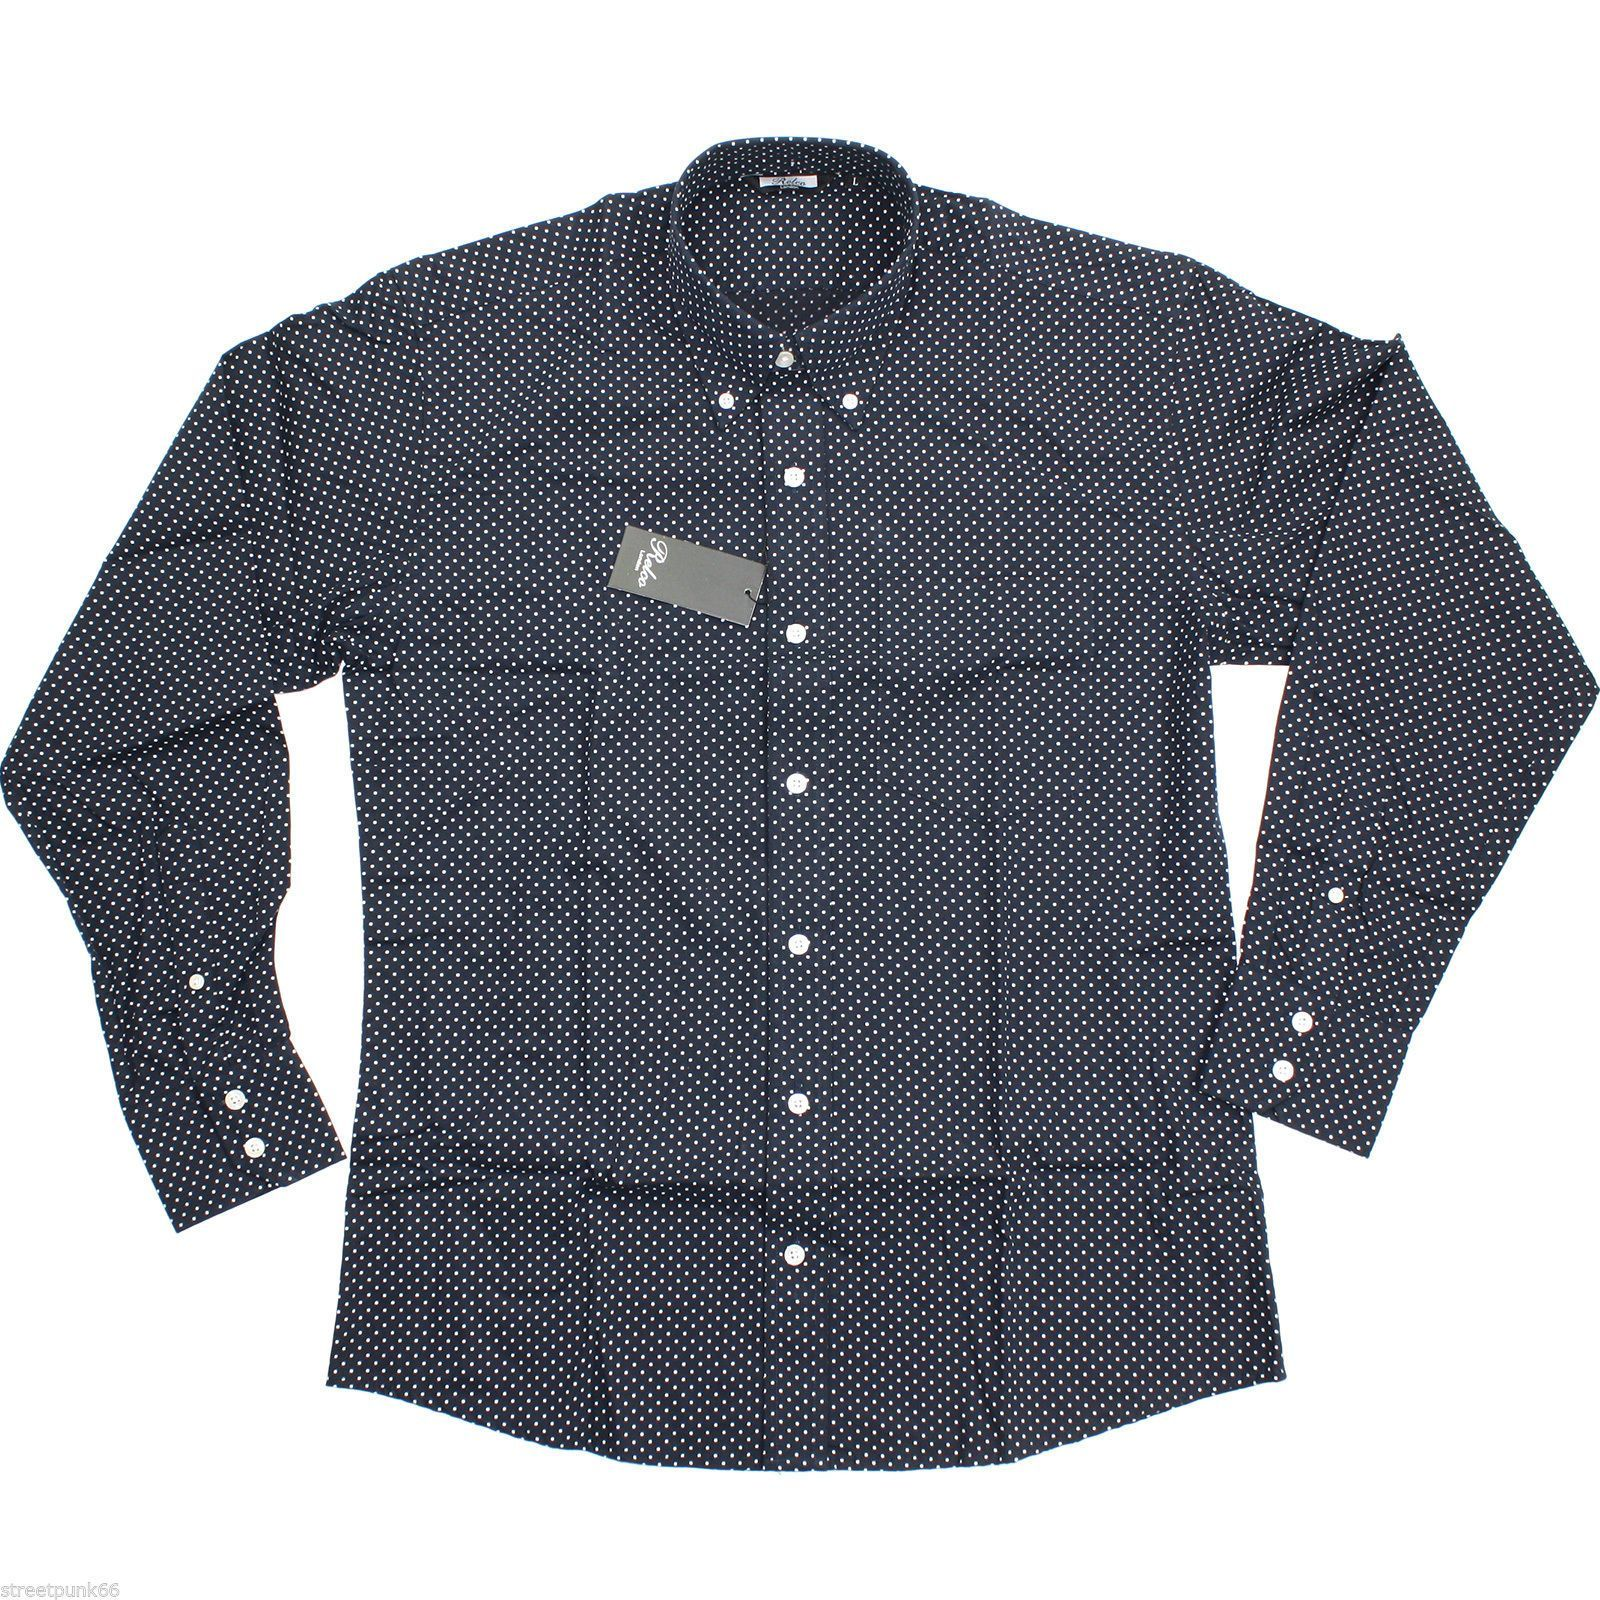 Relco Mens Navy Pin Dot Button Down Long Sleeved Shirt Mod Skin Retro 60s 70s